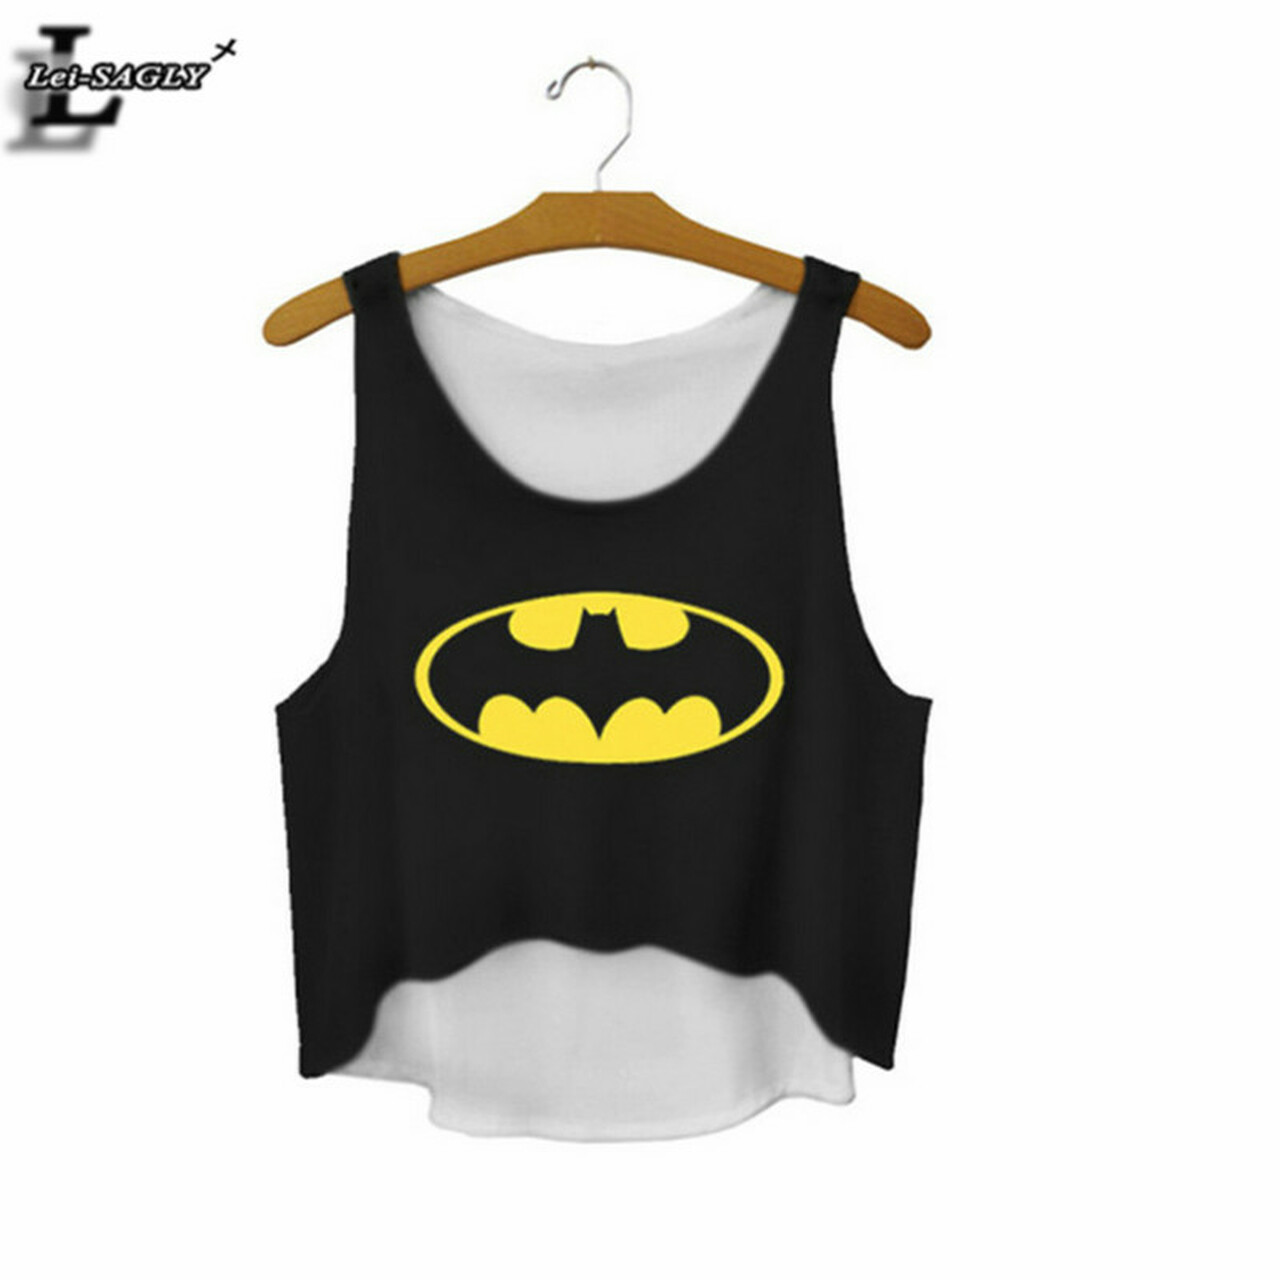 8efa87d34d475 Lei-SAGLY The Batman Sign Cartoon Printed Black Crop Tops Summer Elastic  Cute Sexy Tank ...